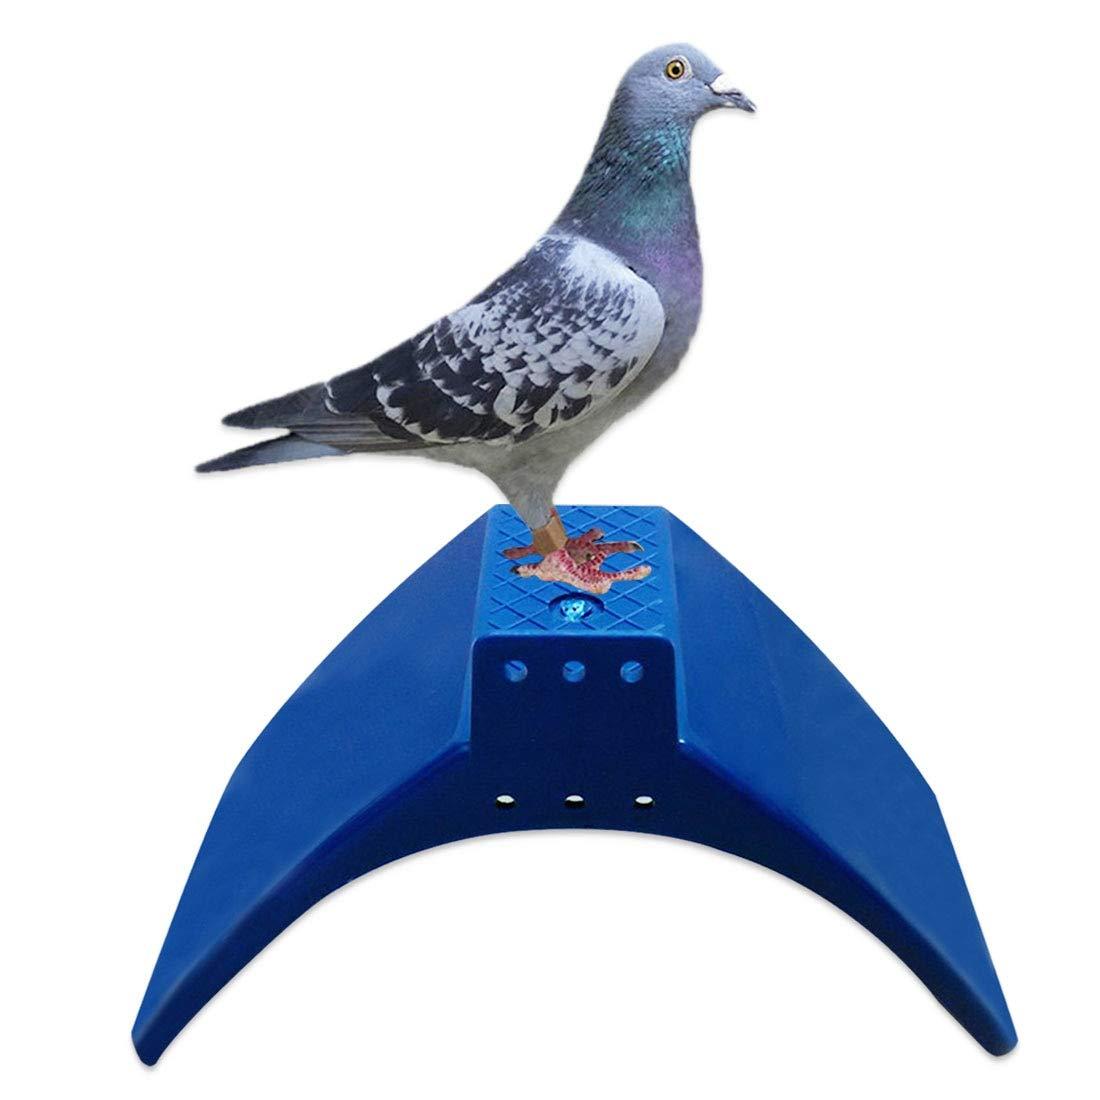 10pcs Plastic Rest Stand Bird House Pigeon Dove Parrots Nest Bird Bed Frame Dwelling Bird Cage Supplies Bird Cages & Nests Home & Garden